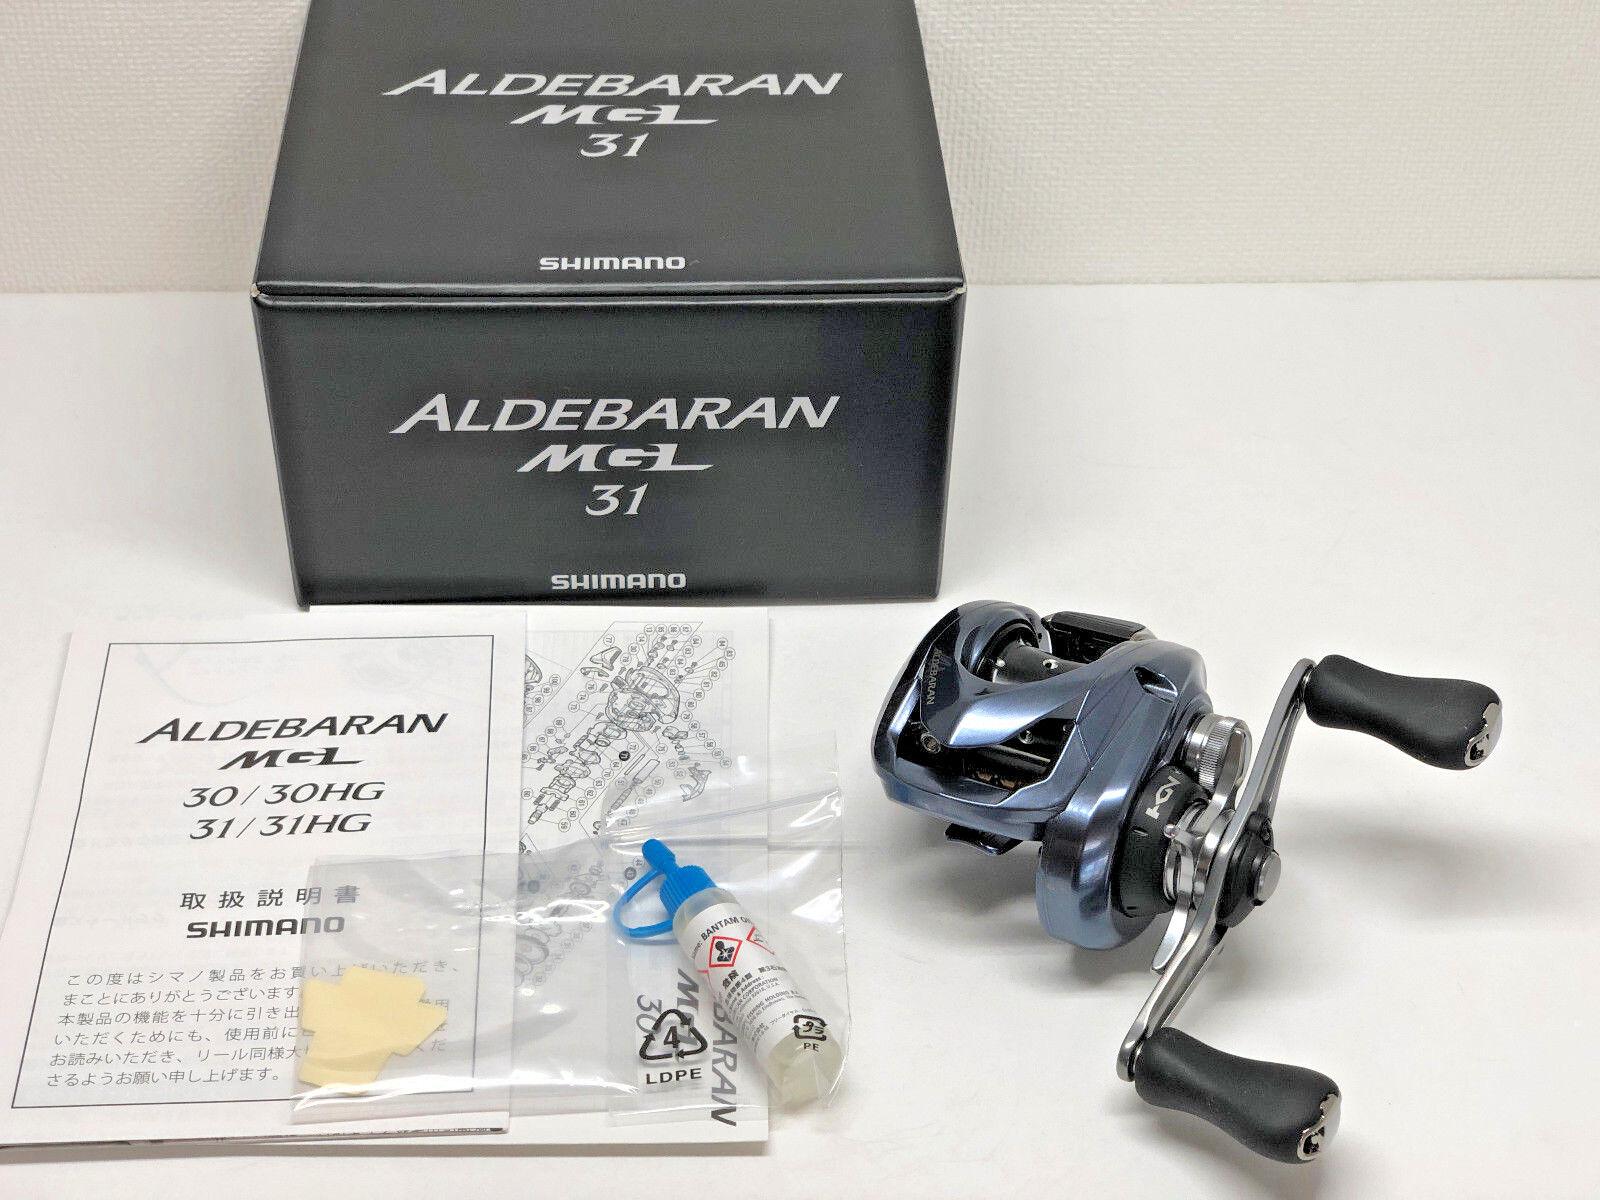 SHIMANO 18 ALDEBARAN MGL 31 LEFT   Free Shipping from Japan